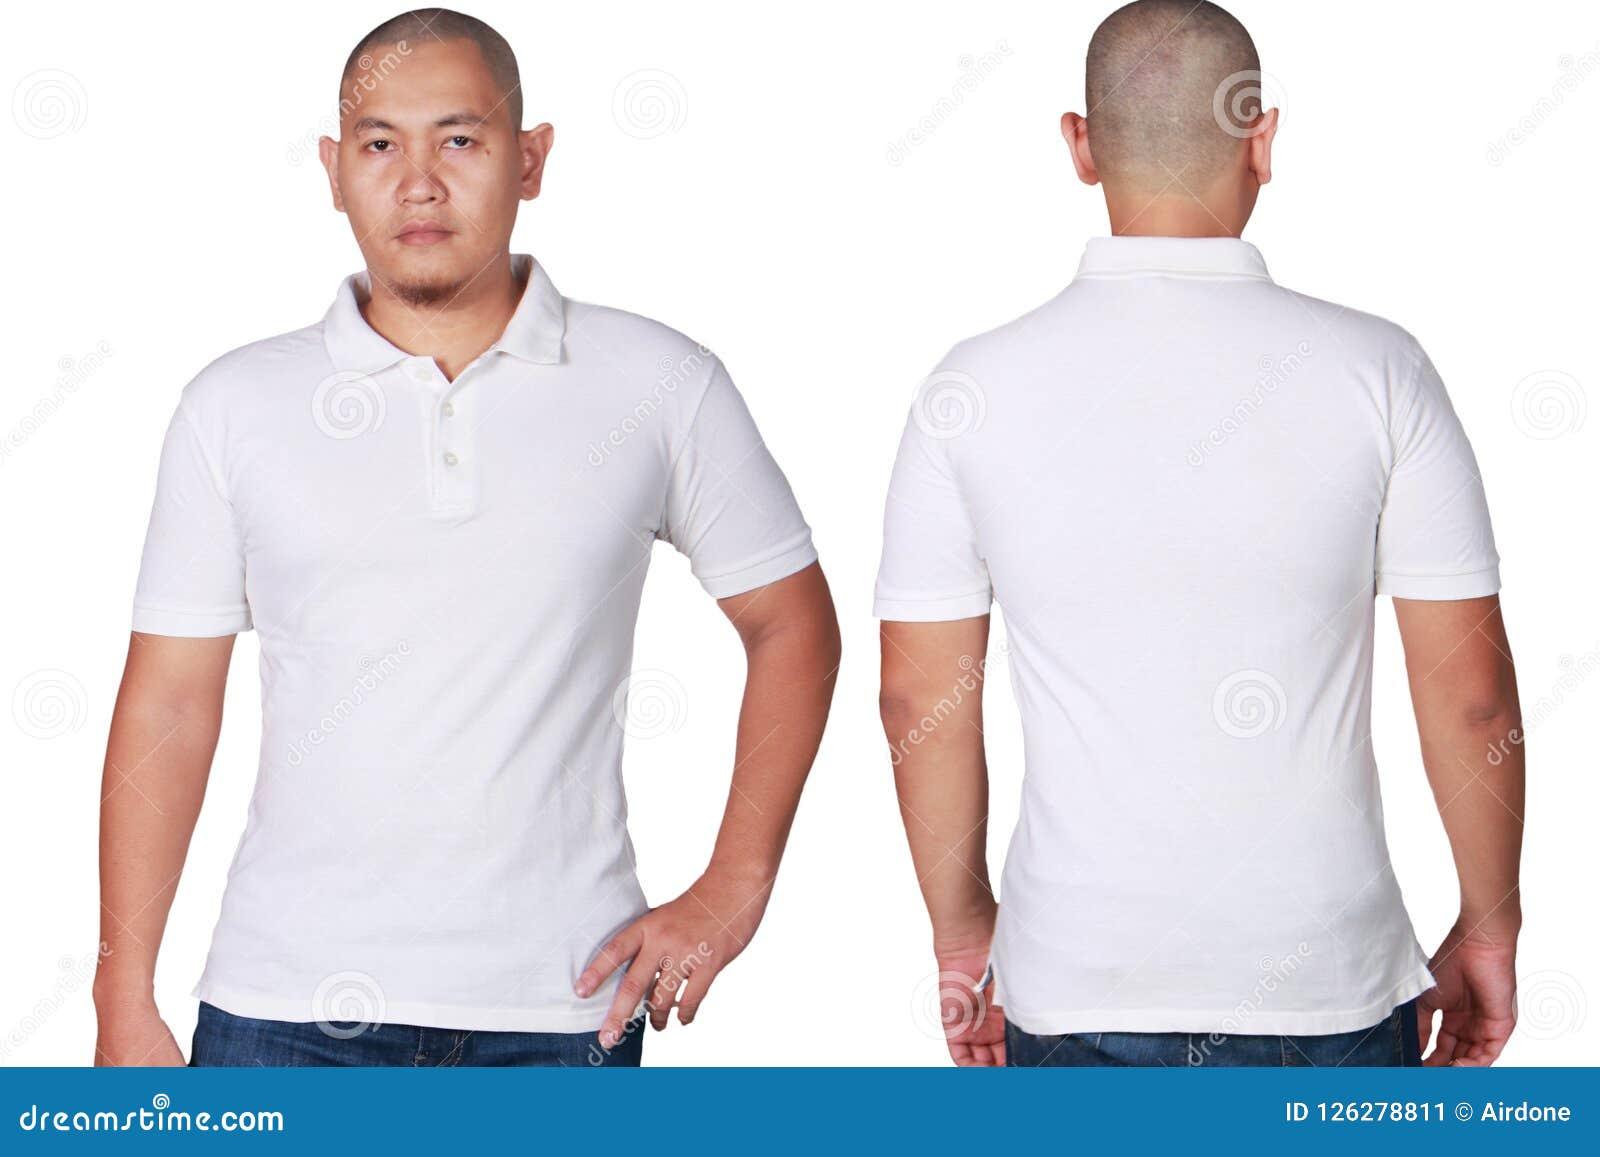 Asian Male Model Wear Plain White Polo Shirt Mockup Stock Image